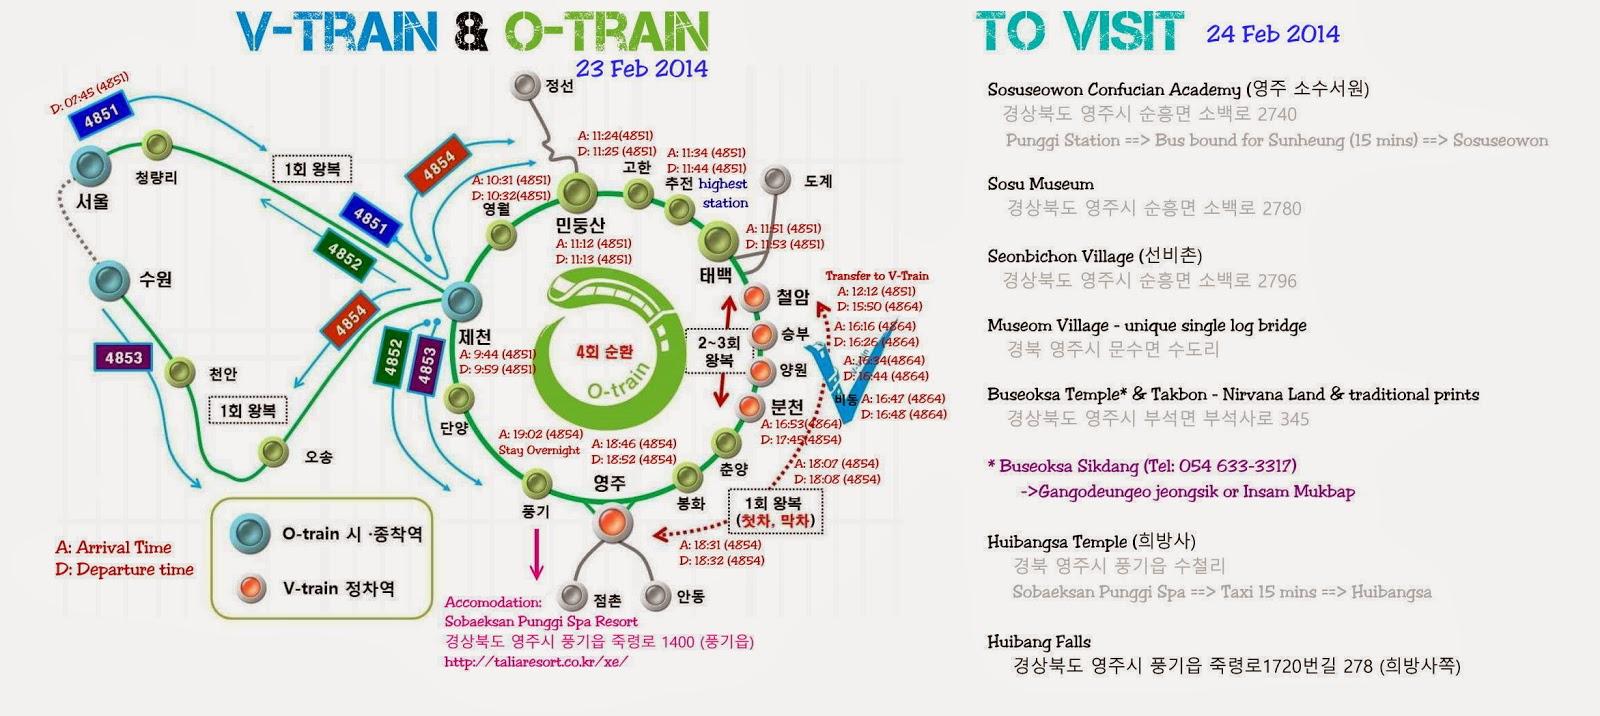 [Korea O-Train] Railroad trip from Seoul to Punggi   meheartsoul.blogspot.com